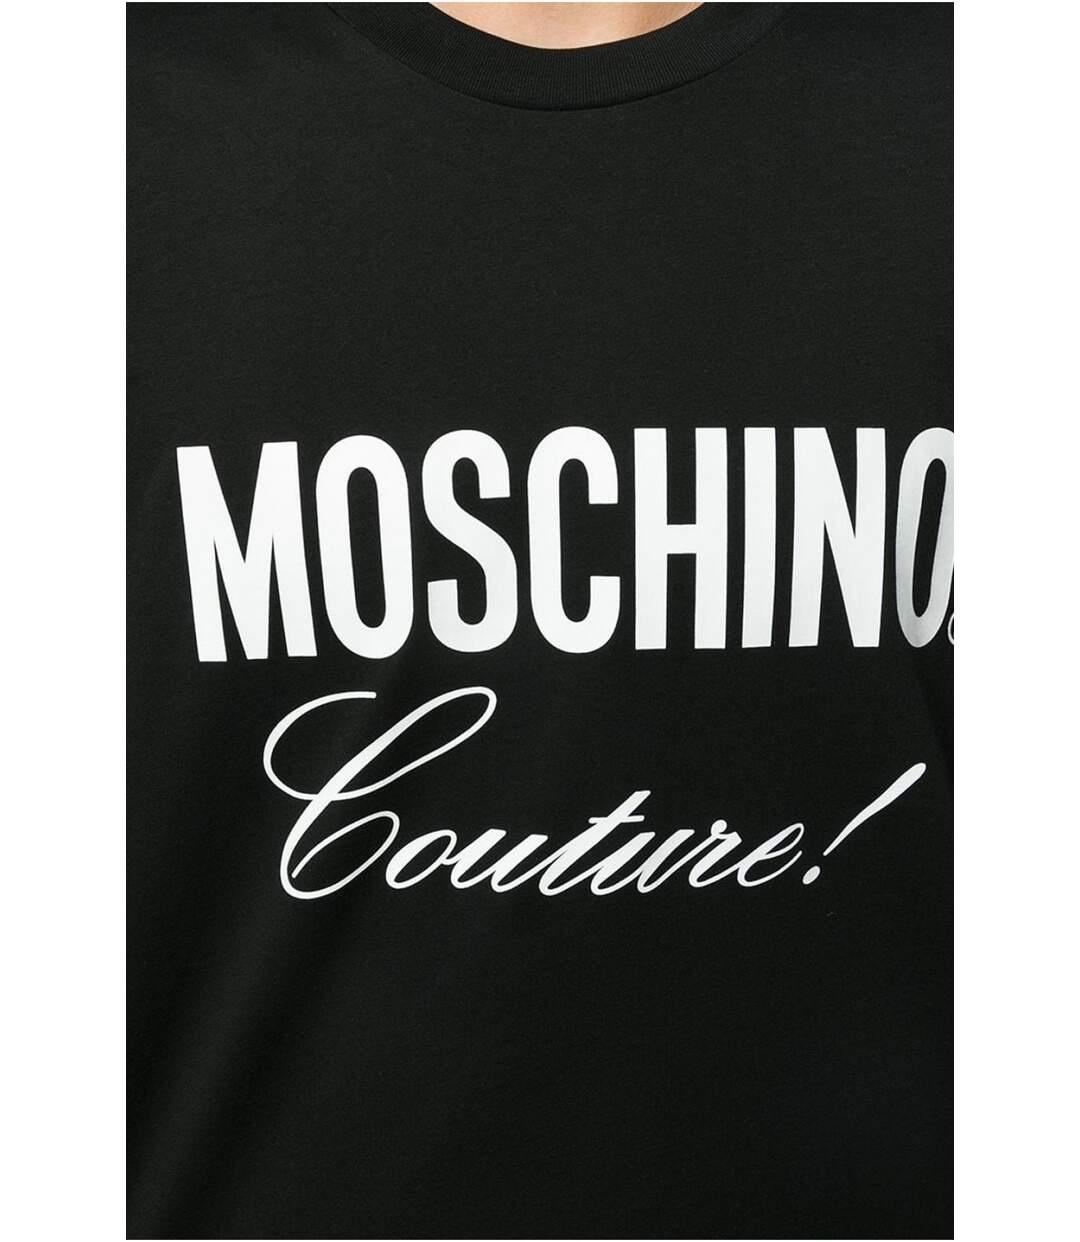 Tee shirt coton logo  -  Moschino - Homme